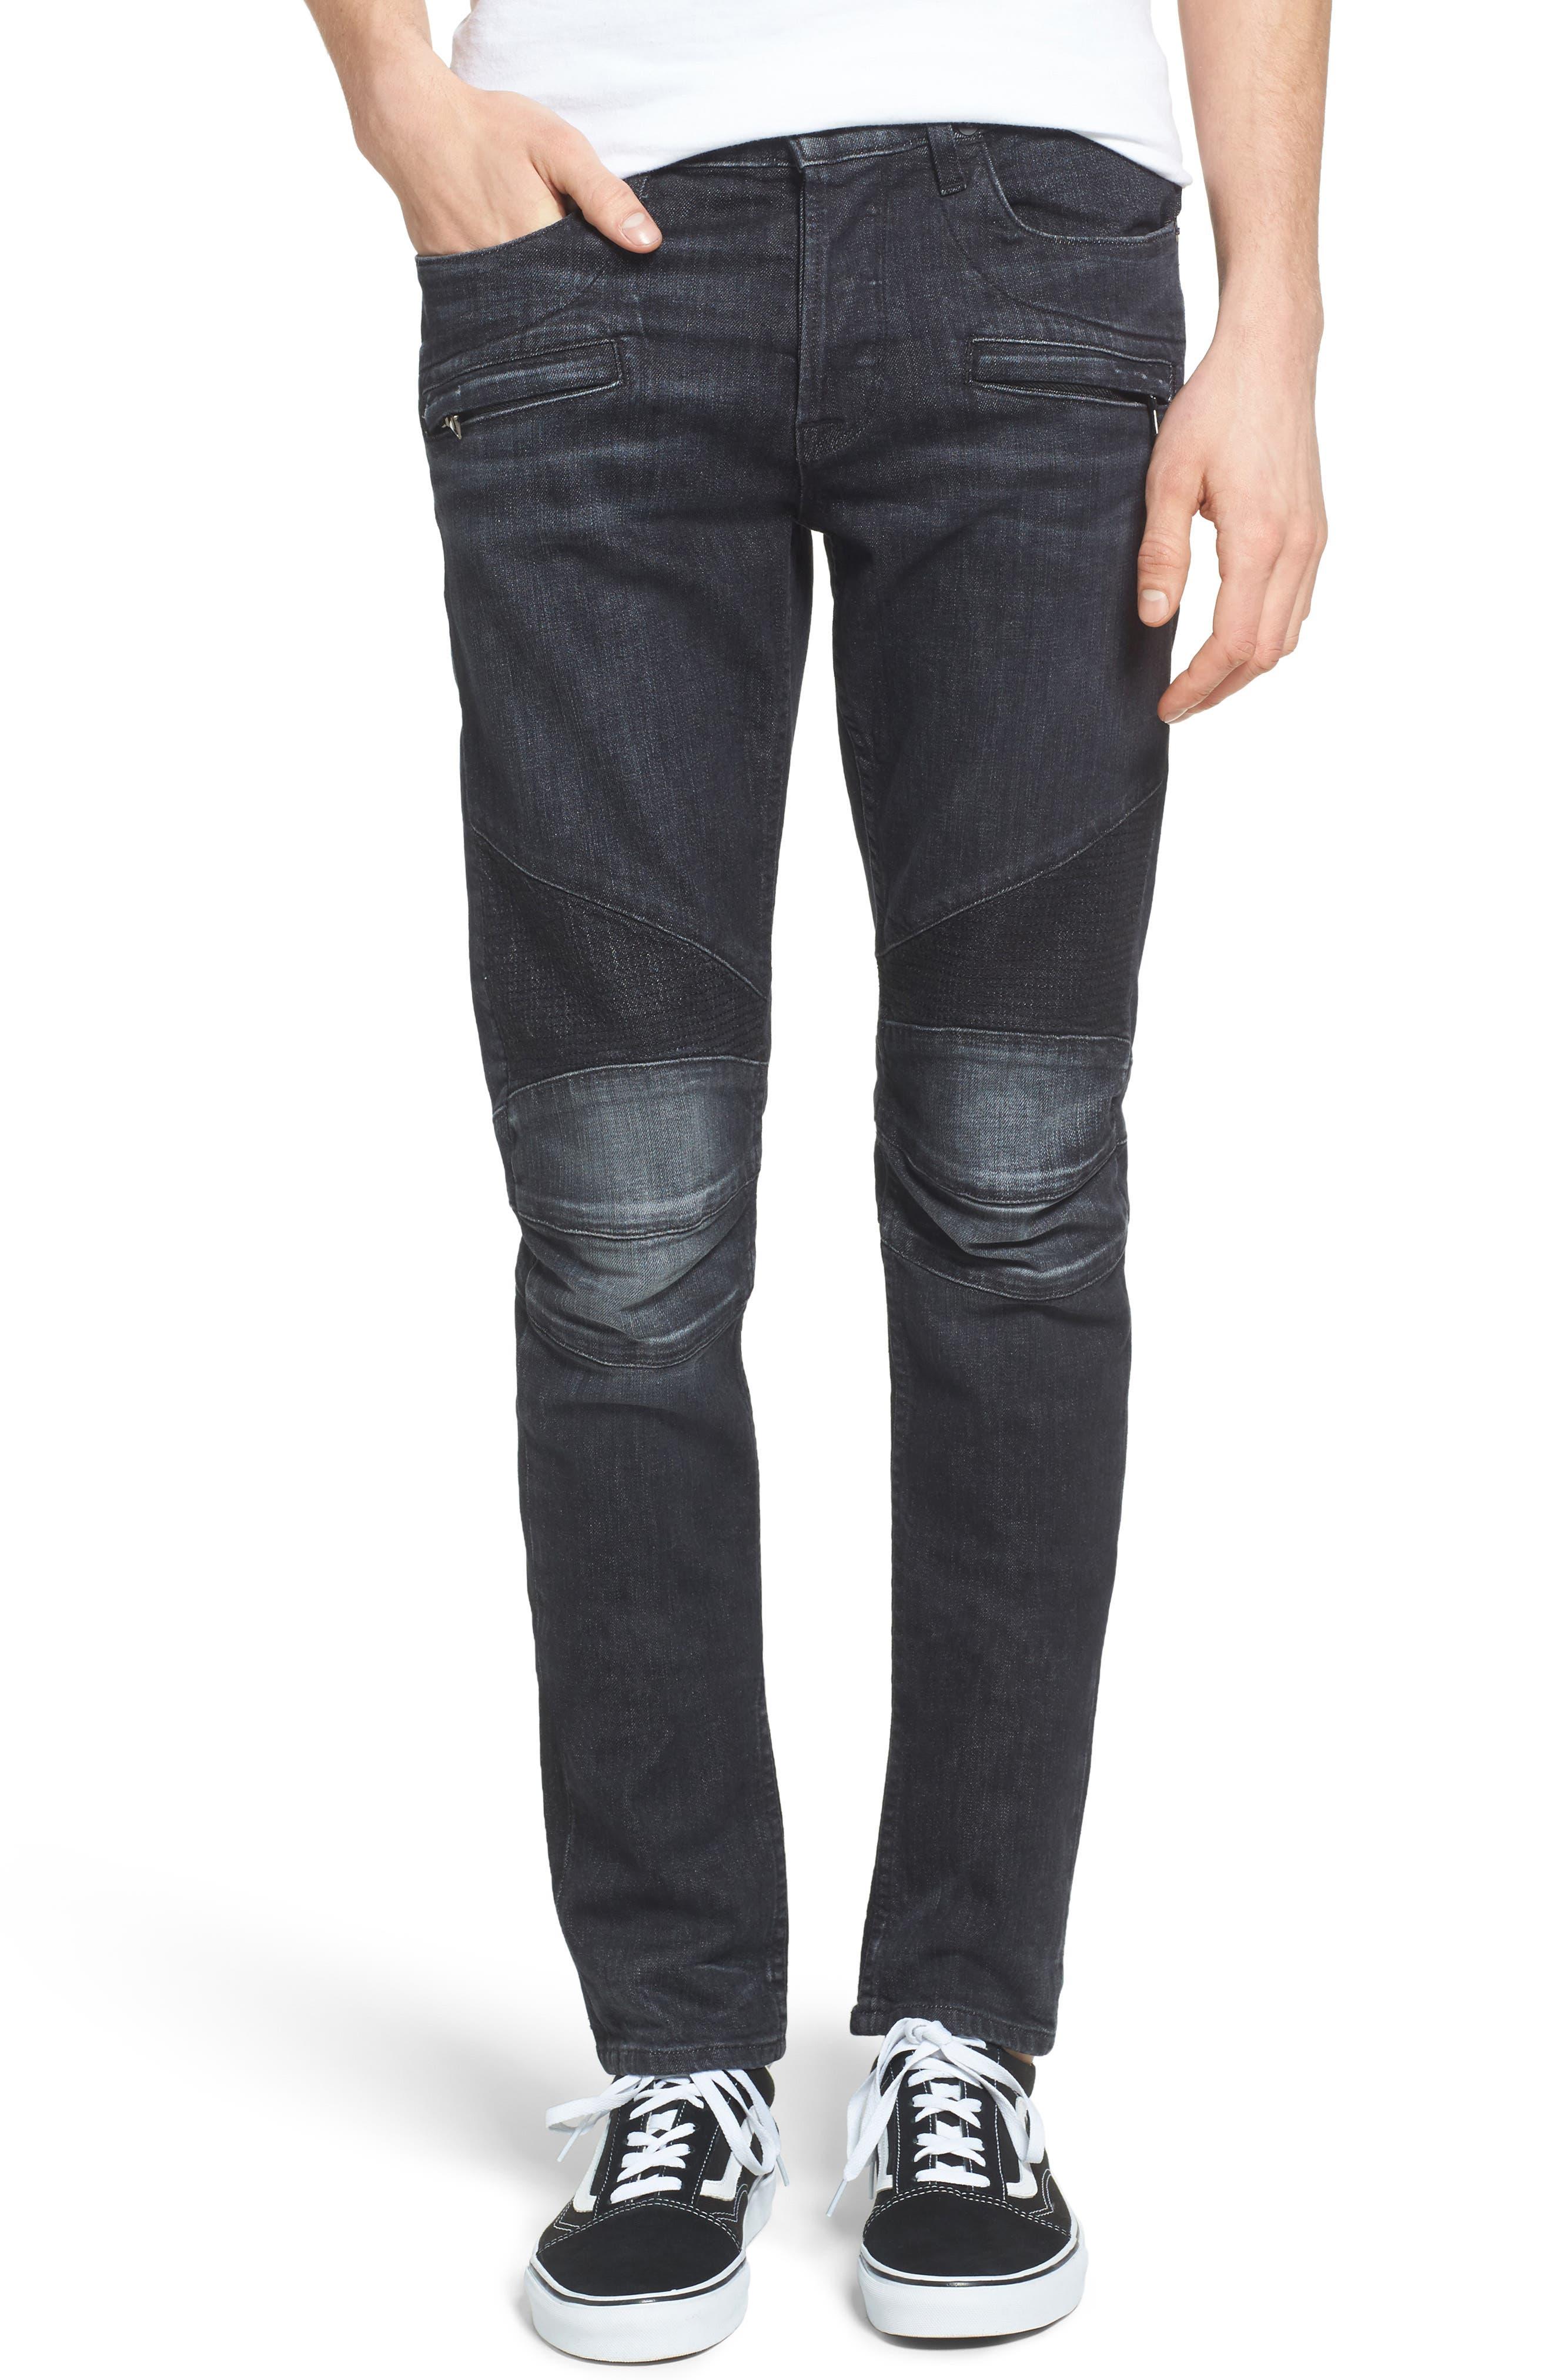 Blinder Skinny Fit Moto Jeans,                             Main thumbnail 1, color,                             Sparring 2